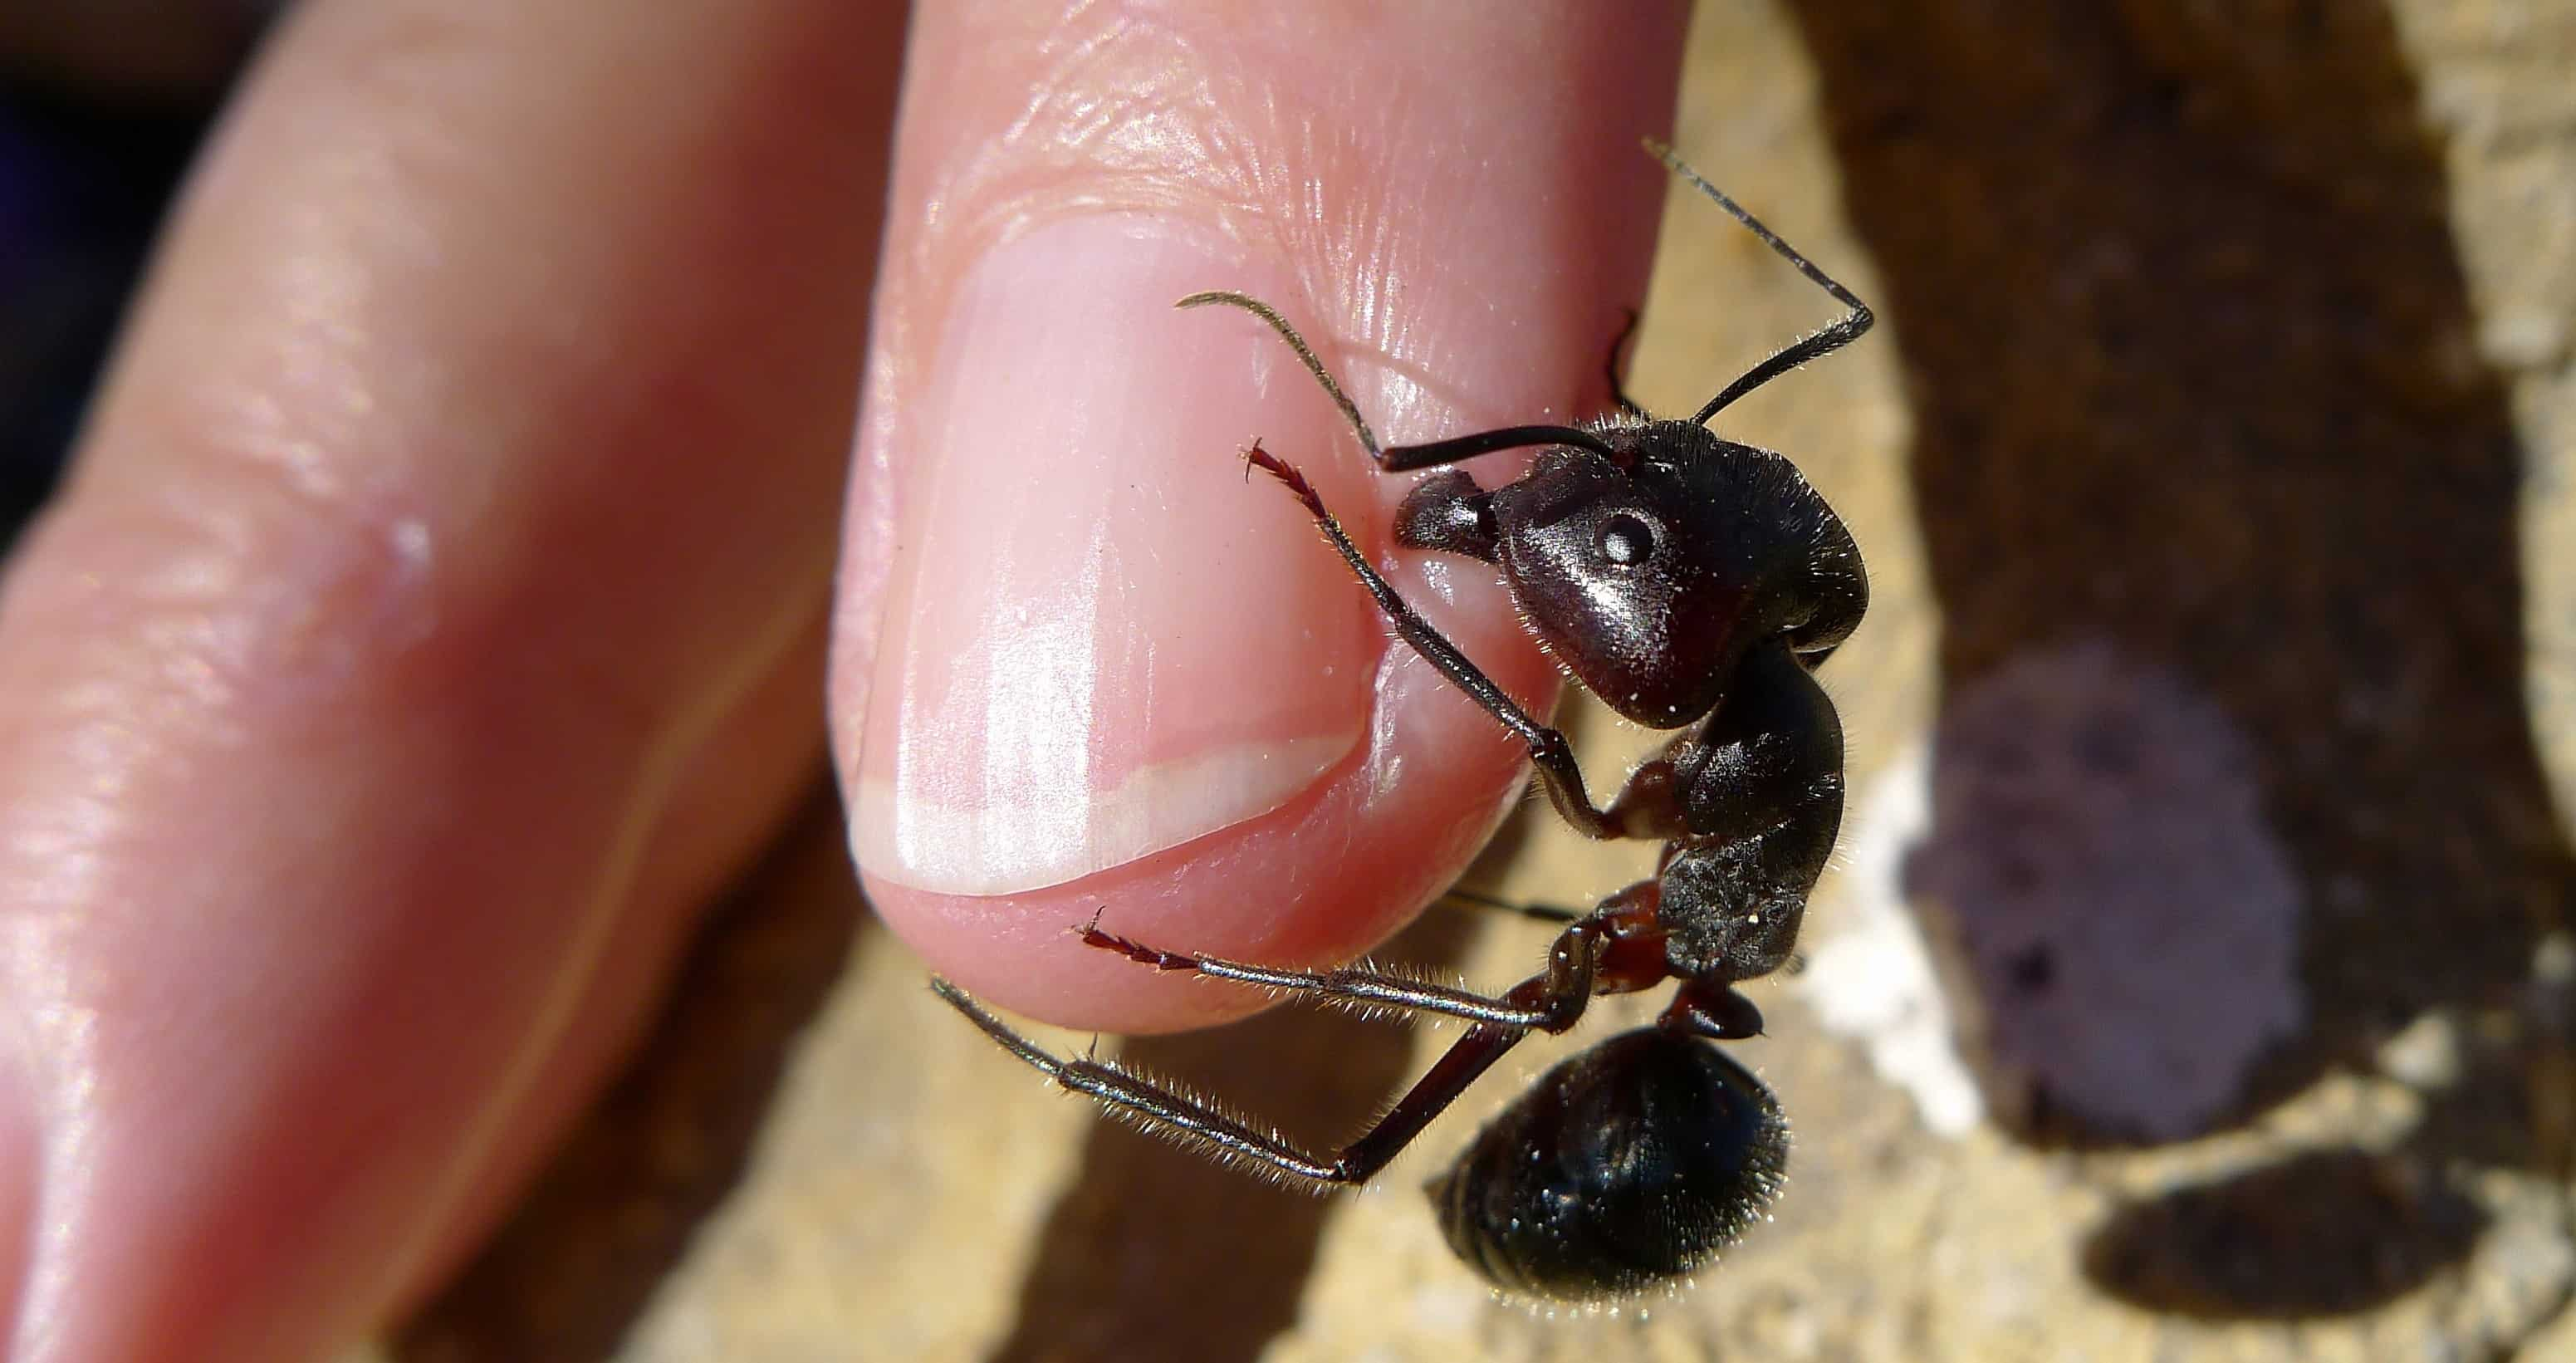 Ant biting a finger; CC Image courtesy of John Tan on Flickr.